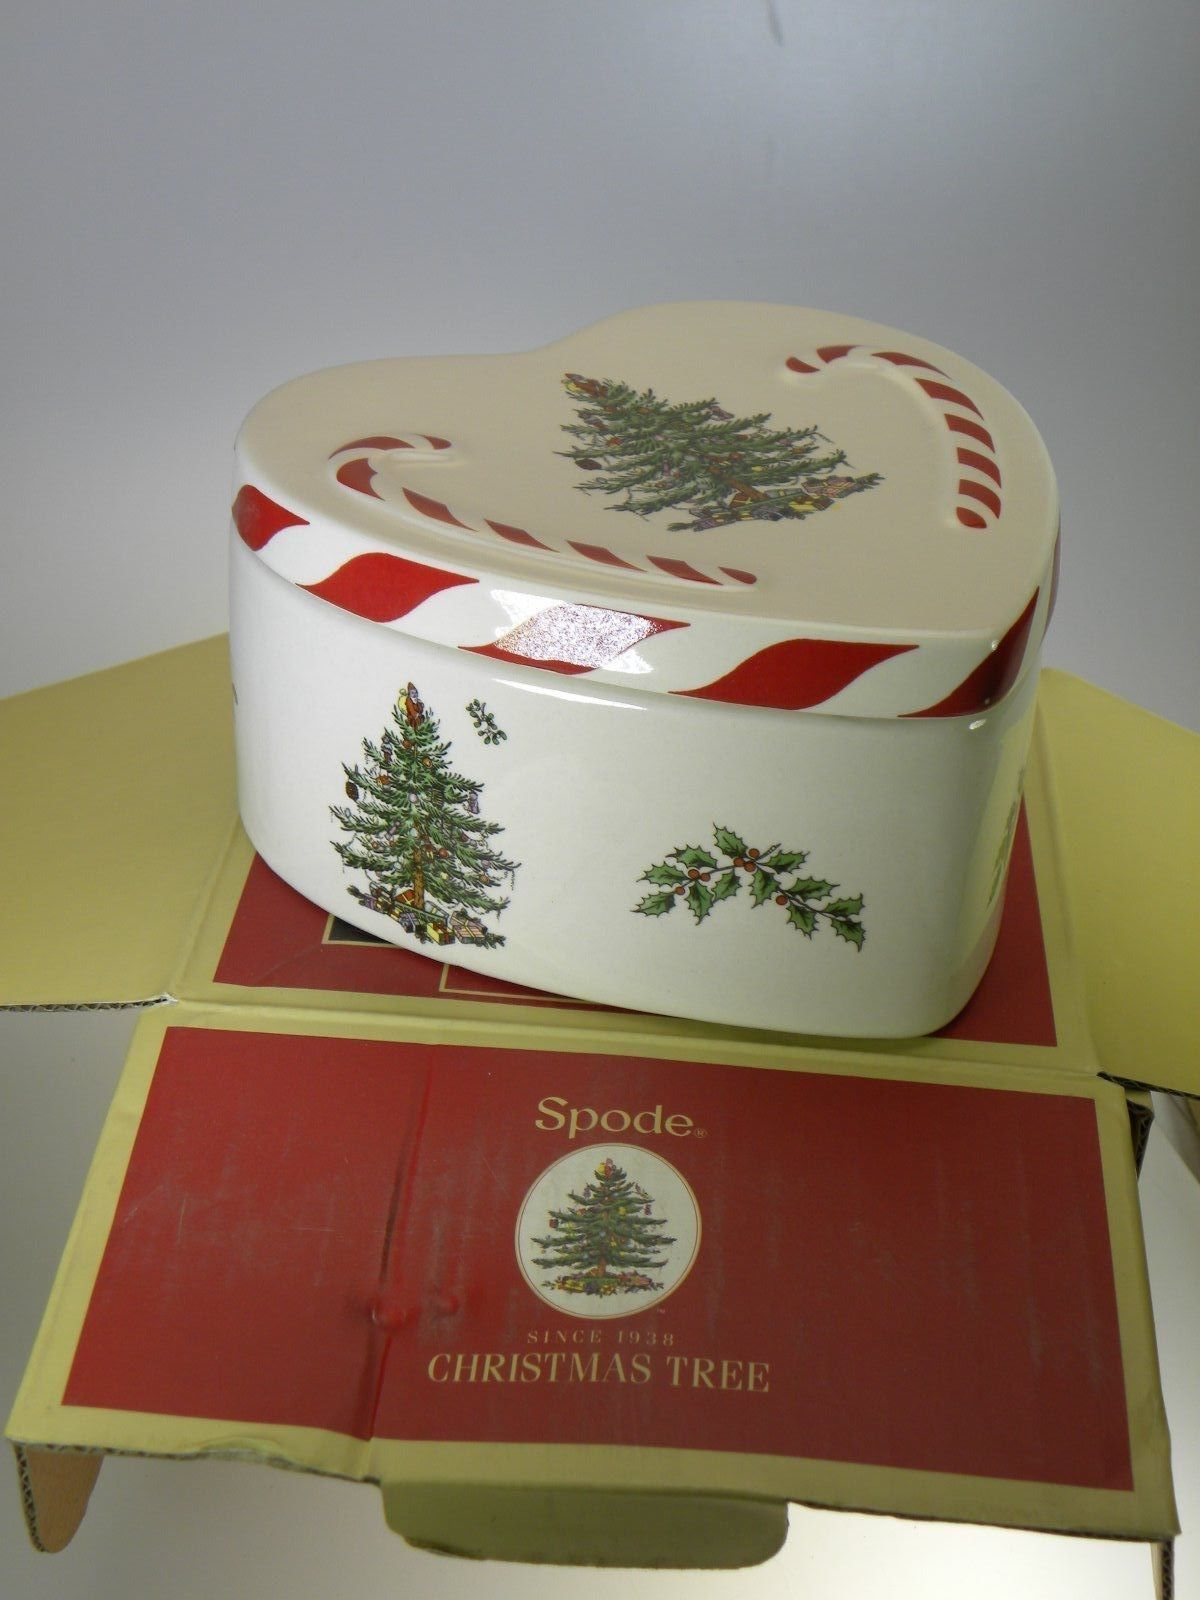 "Spode Christmas Tree Peppermint Lidded Heart Box 4.75"" New in Gift Box MSRP $50 - $19.31"